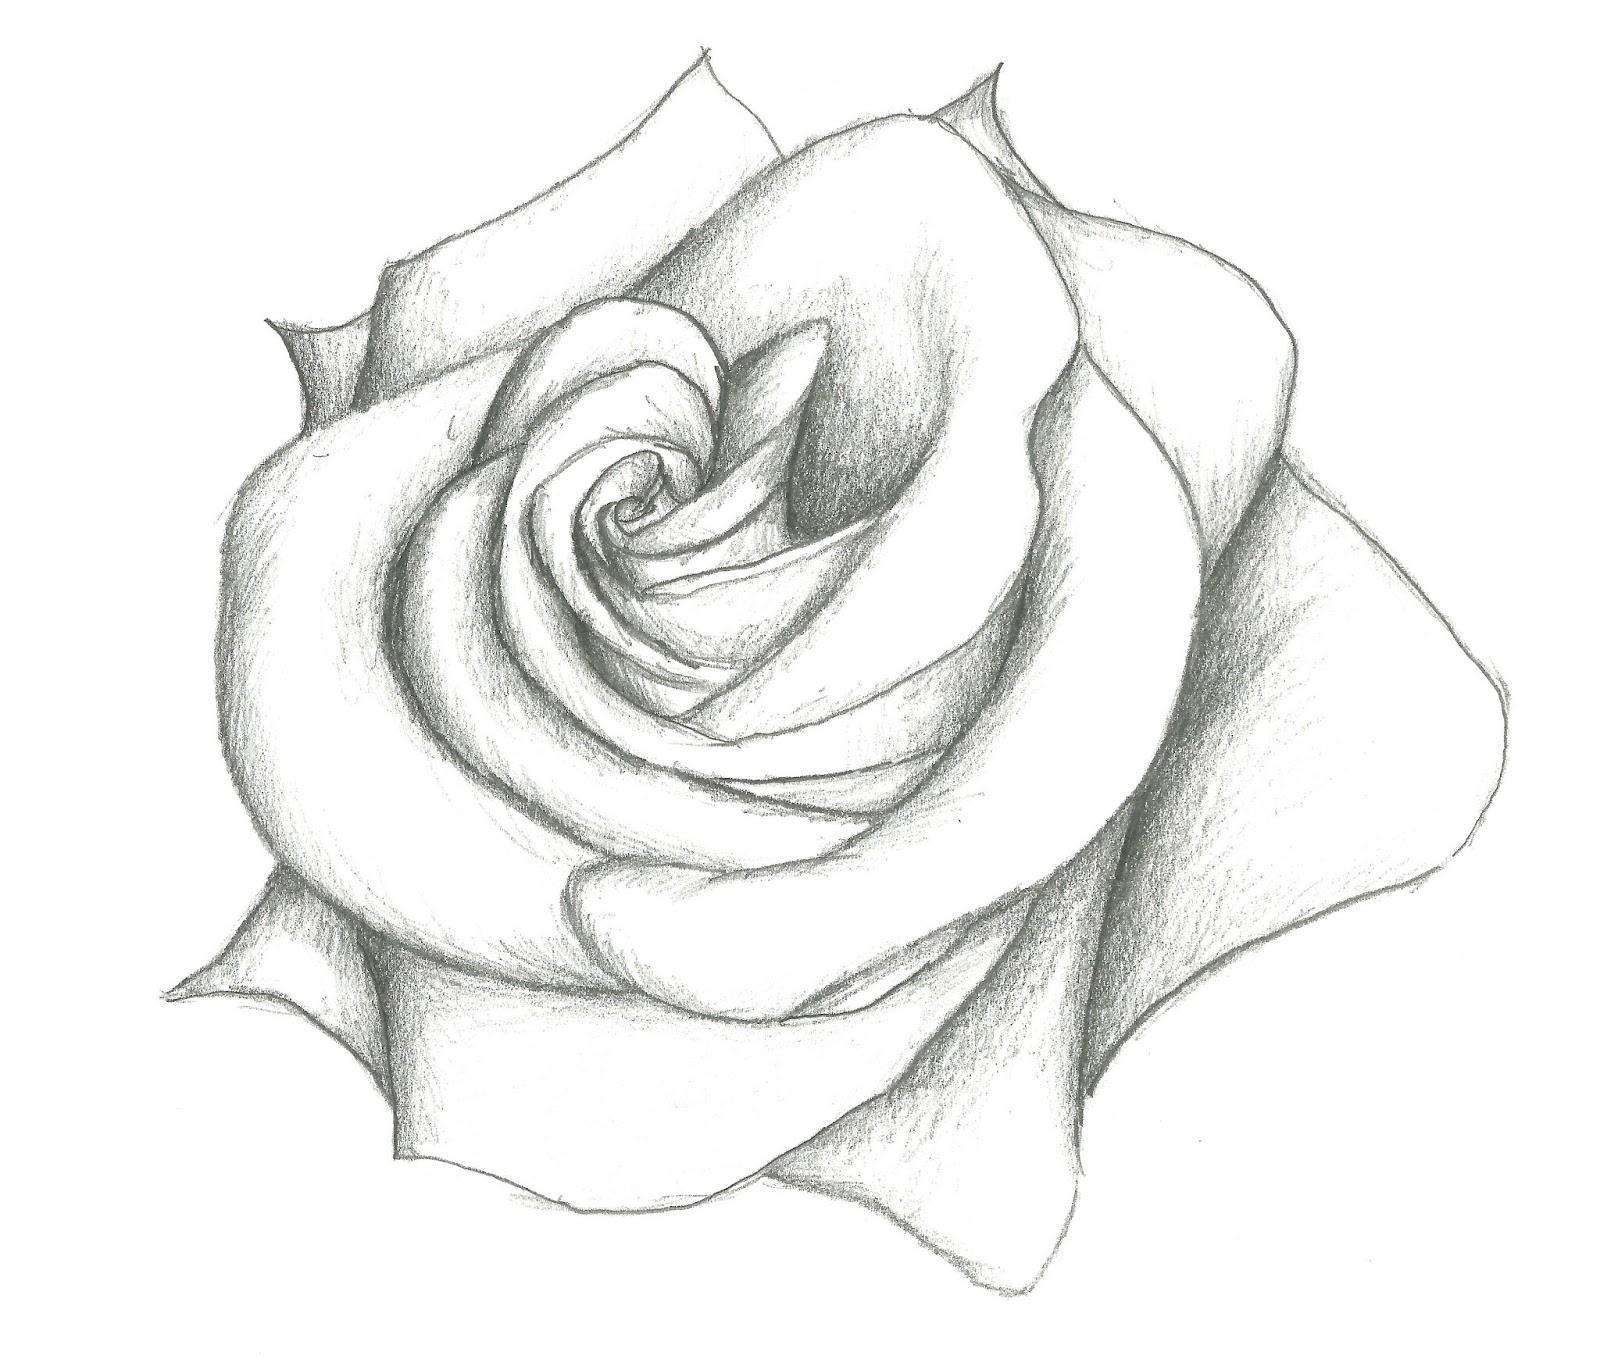 1600x1370 Simple Pencil Sketch Of Flowers